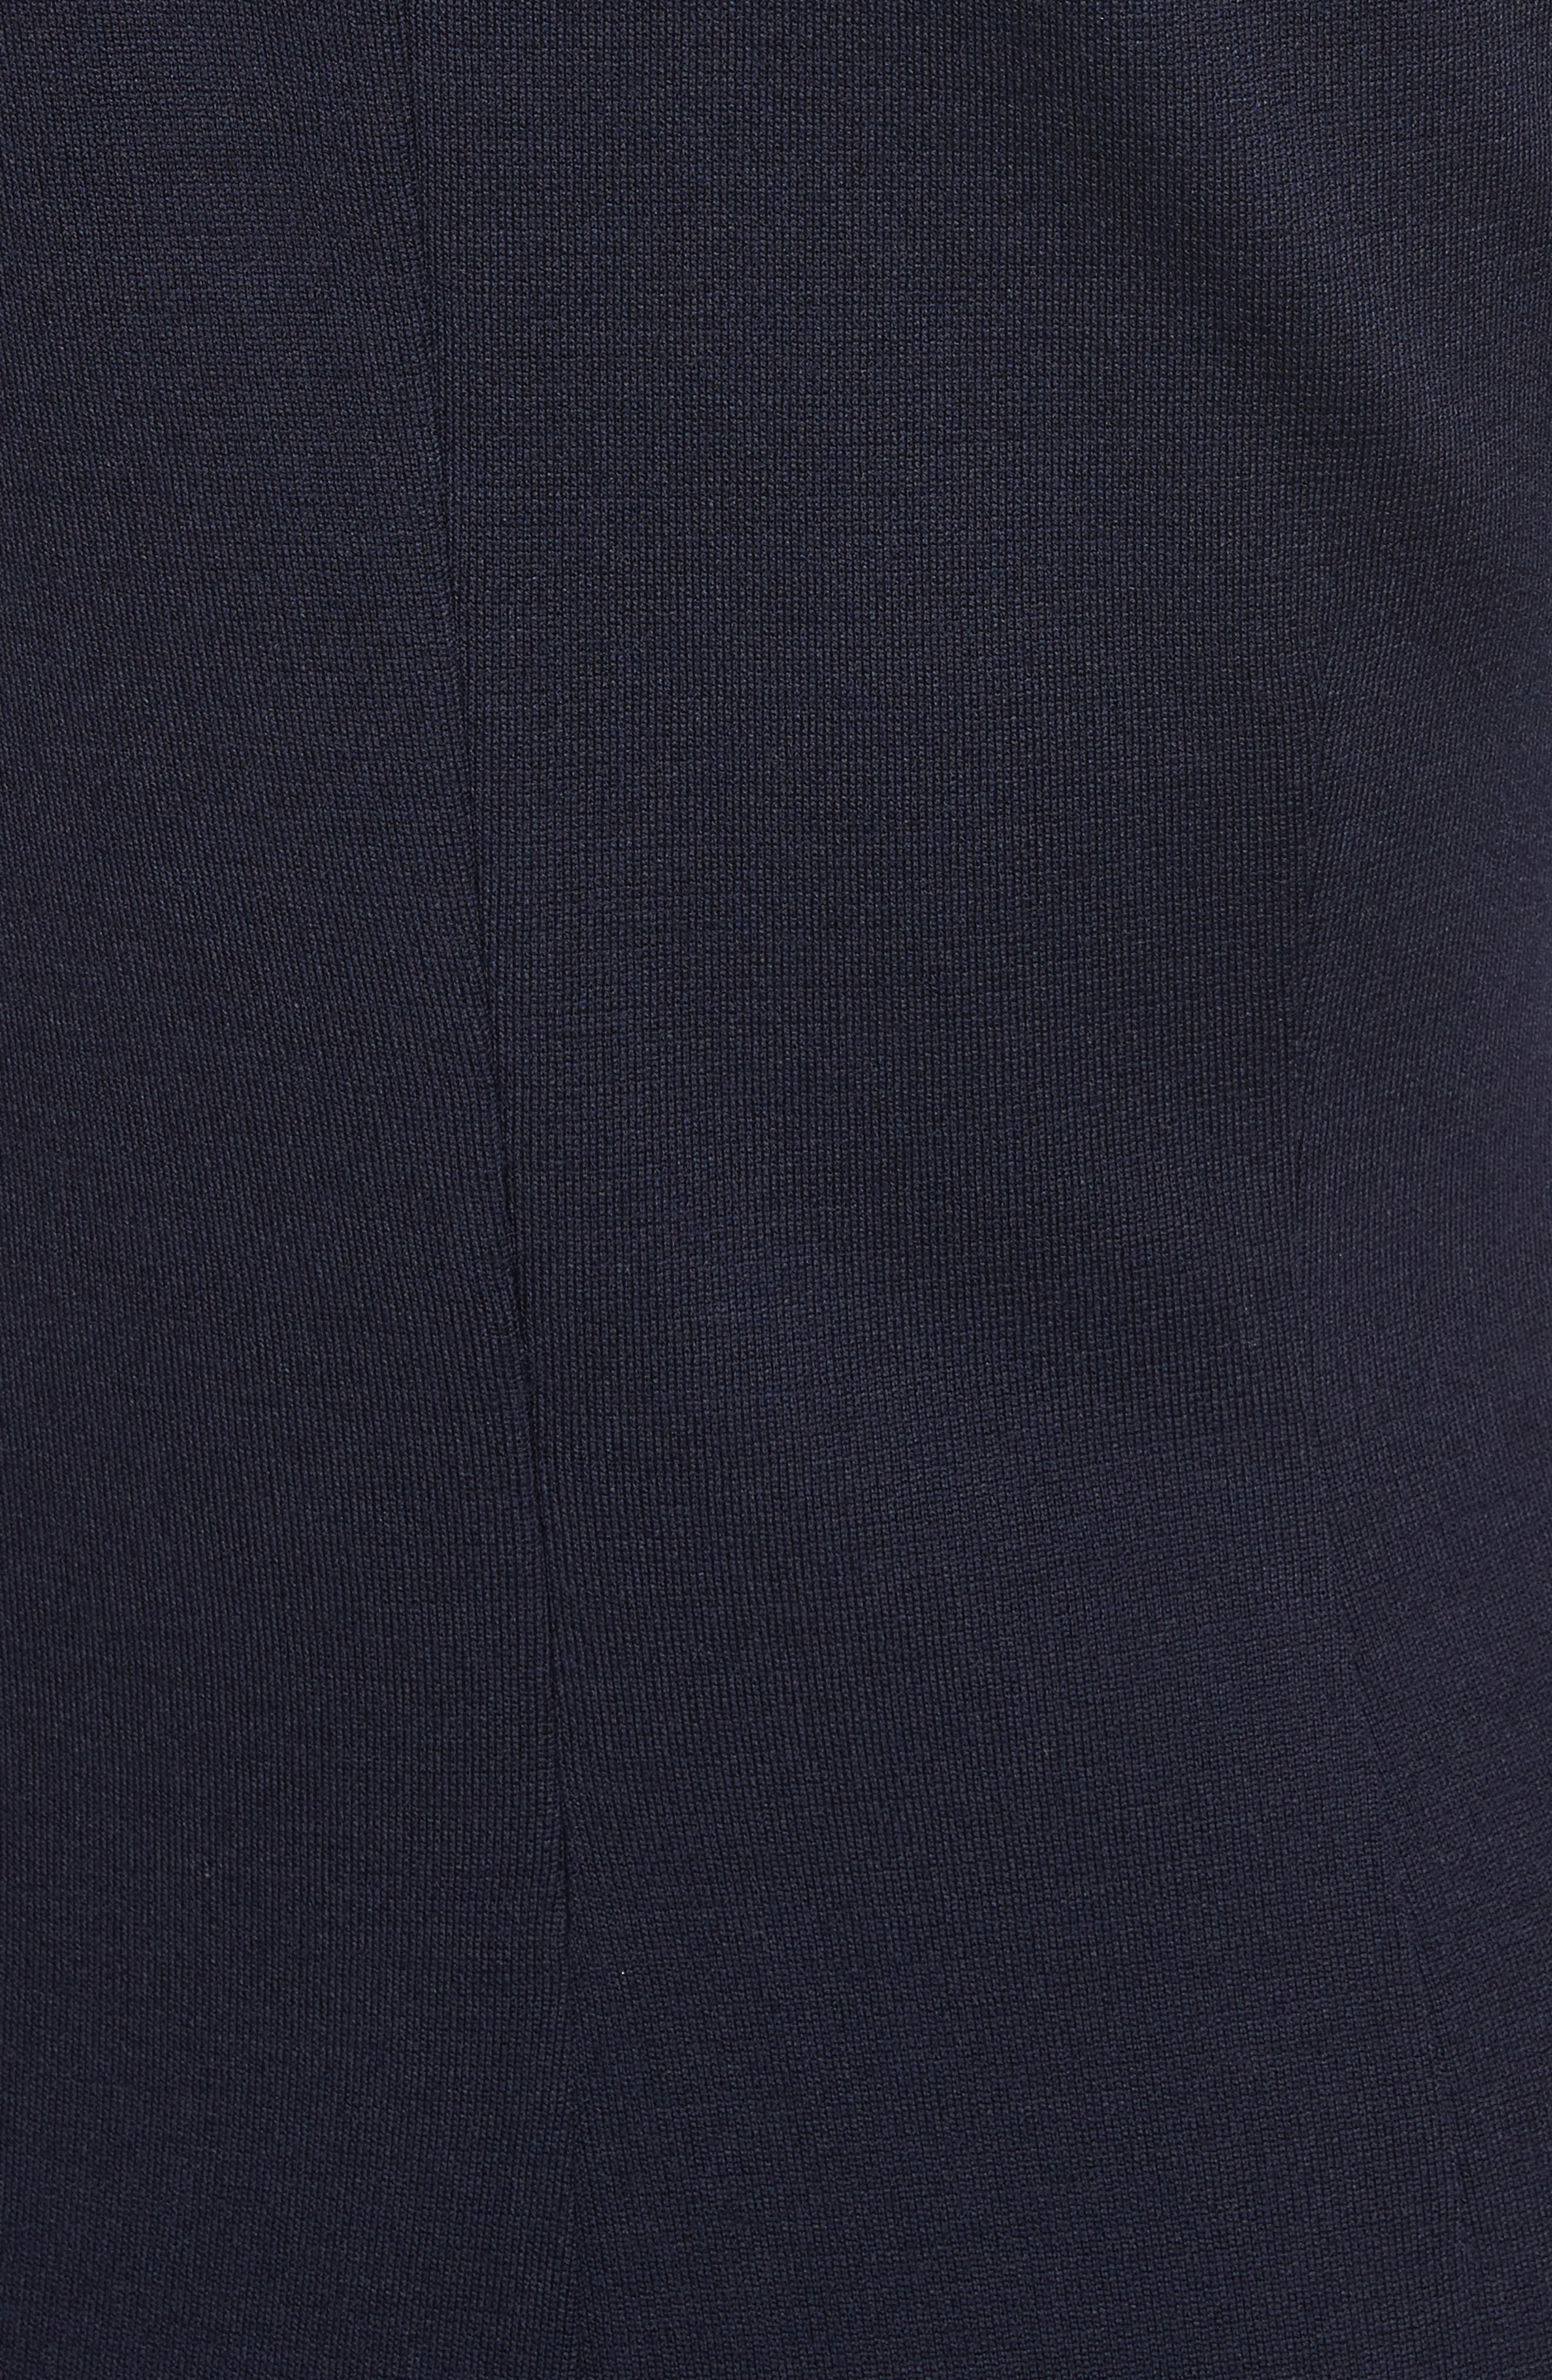 Milano Knit A-Line Dress,                             Alternate thumbnail 6, color,                             Navy